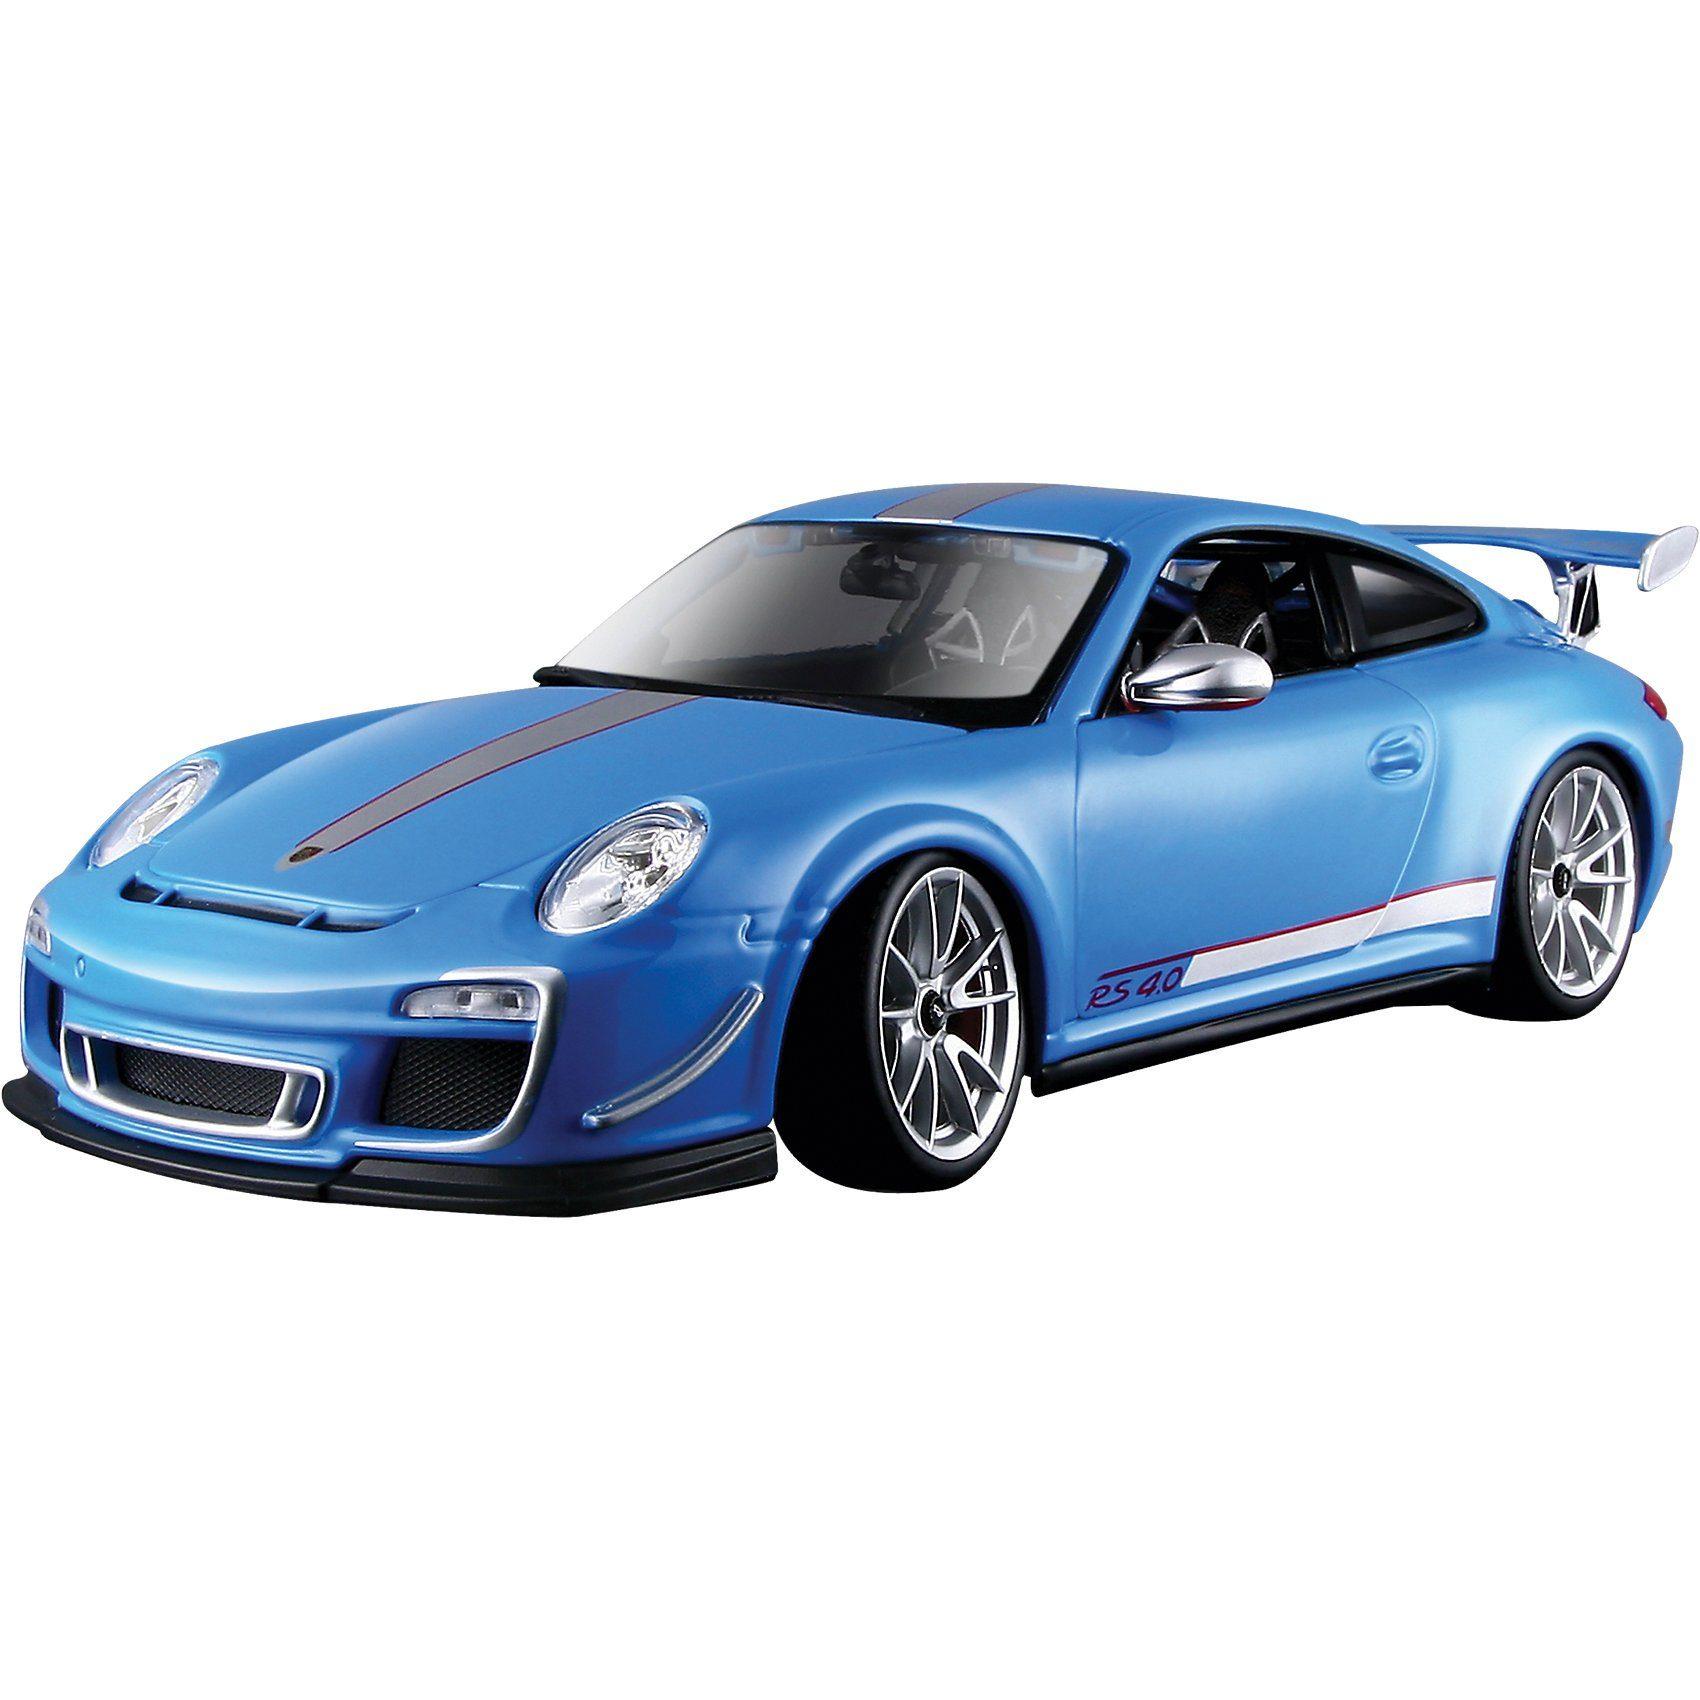 Bburago Porsche GTS RS 4.0, hellblau 1:18